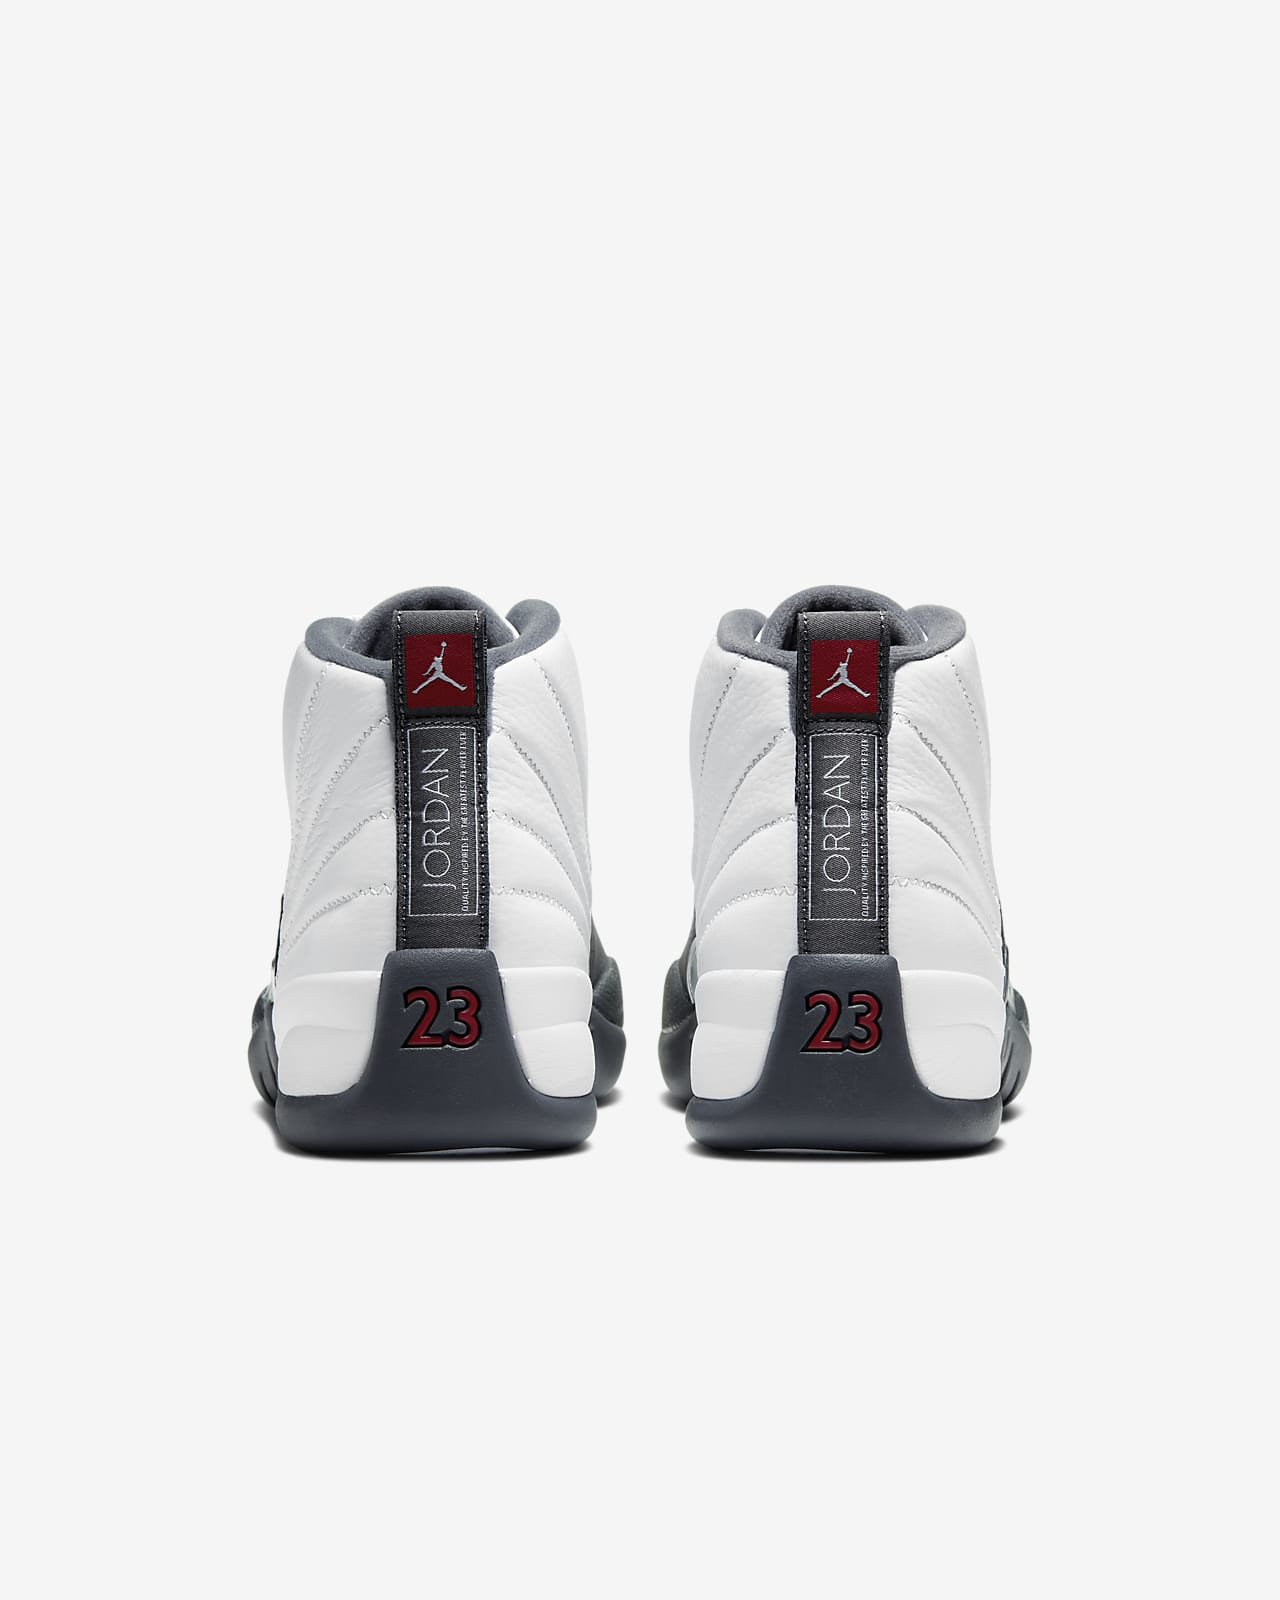 Air Jordan 12 Retro Shoes